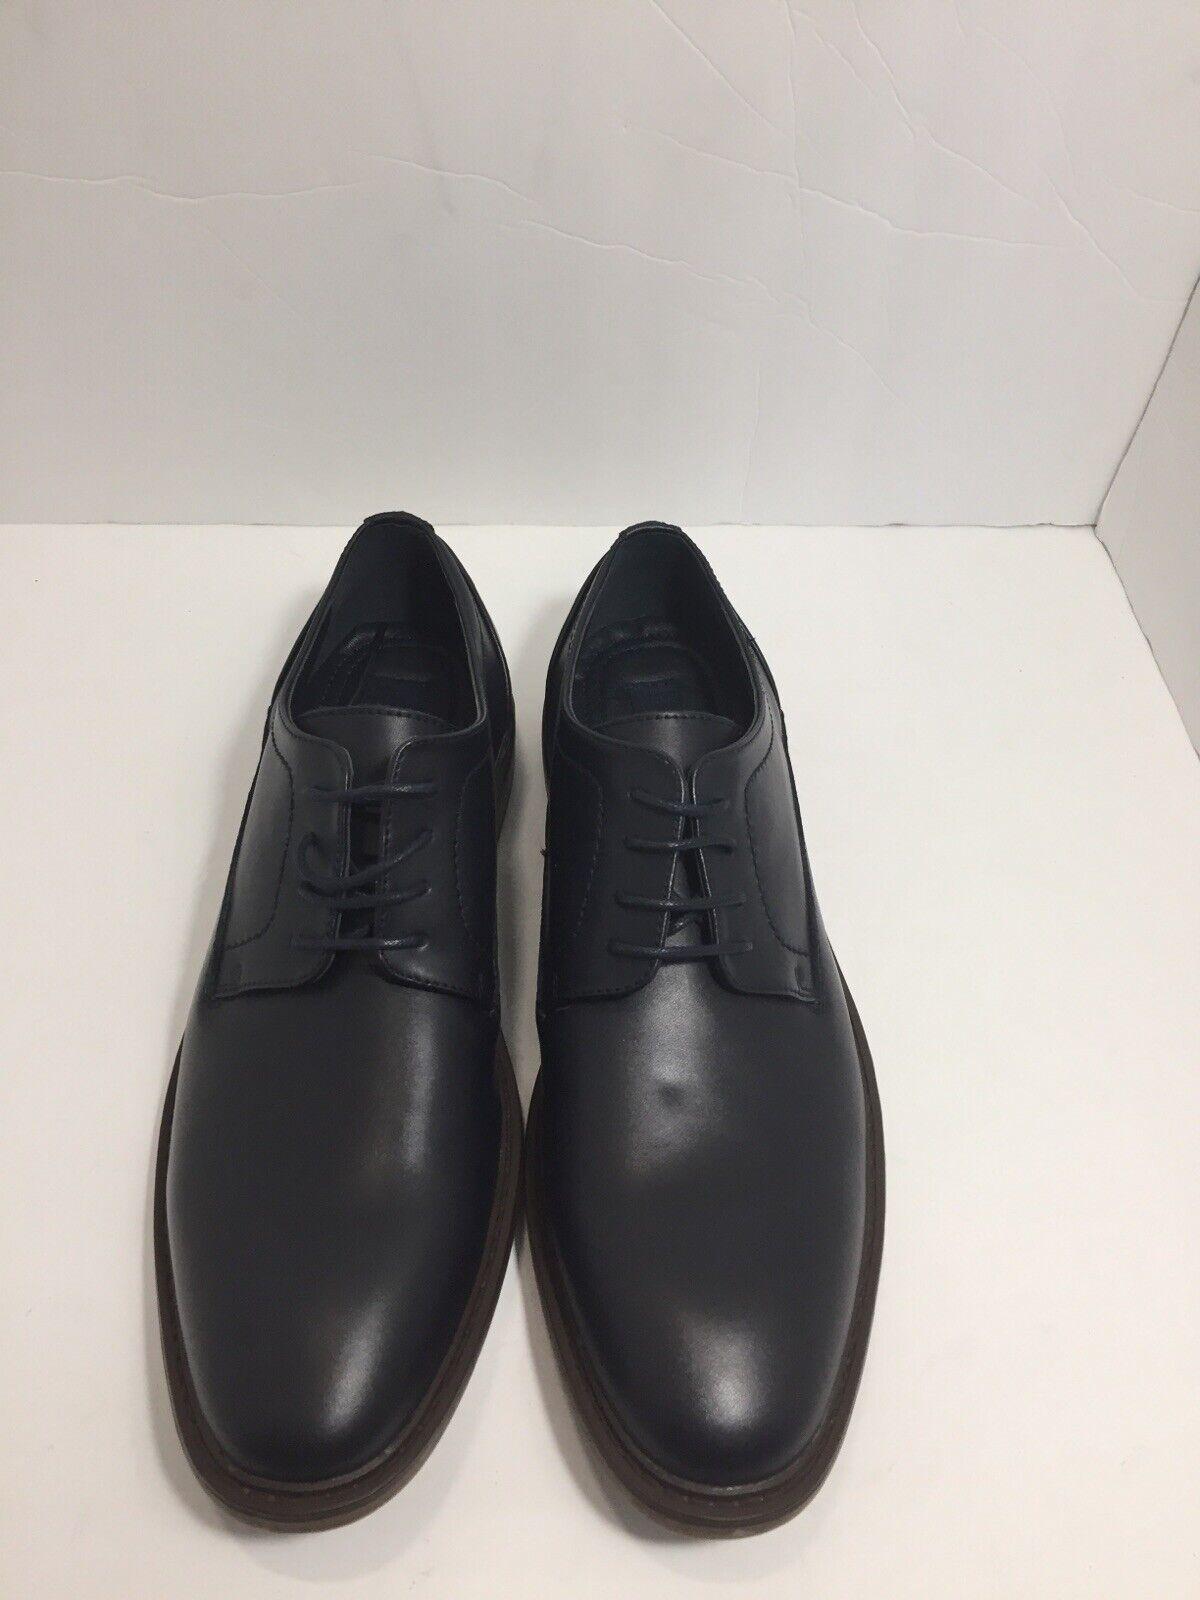 Joseph Abboud Blue Leather Lace Up Oxfords Casual Dress Shoes Greyson Size 9.5US